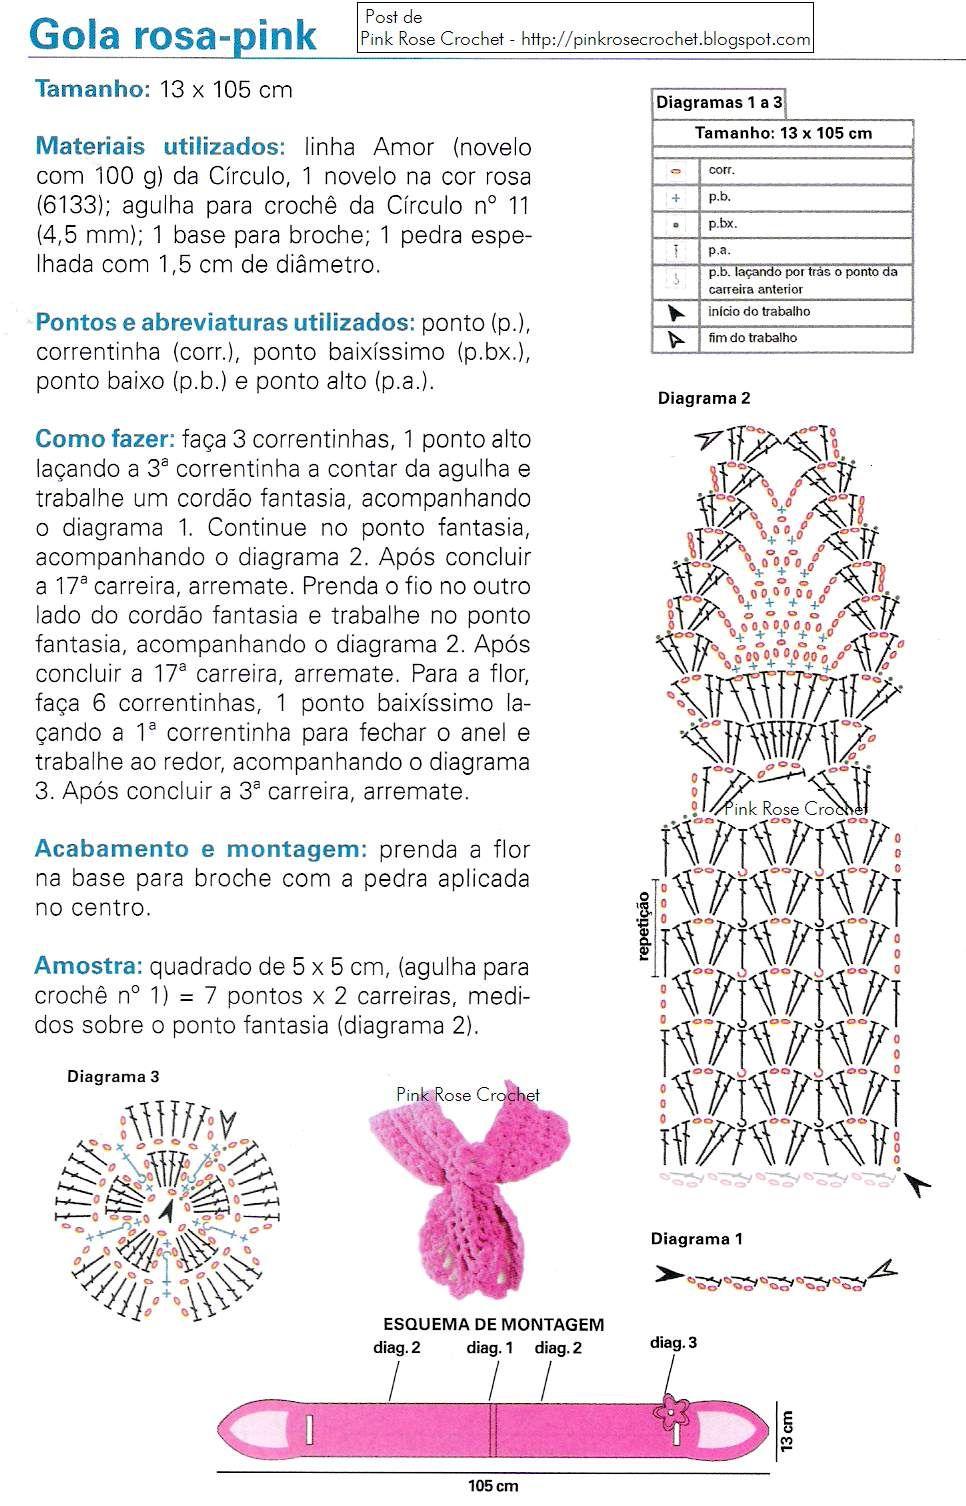 Pin de Gloria Bobadilla en COSAS LINDAS CROCHET | Pinterest | Gorros ...